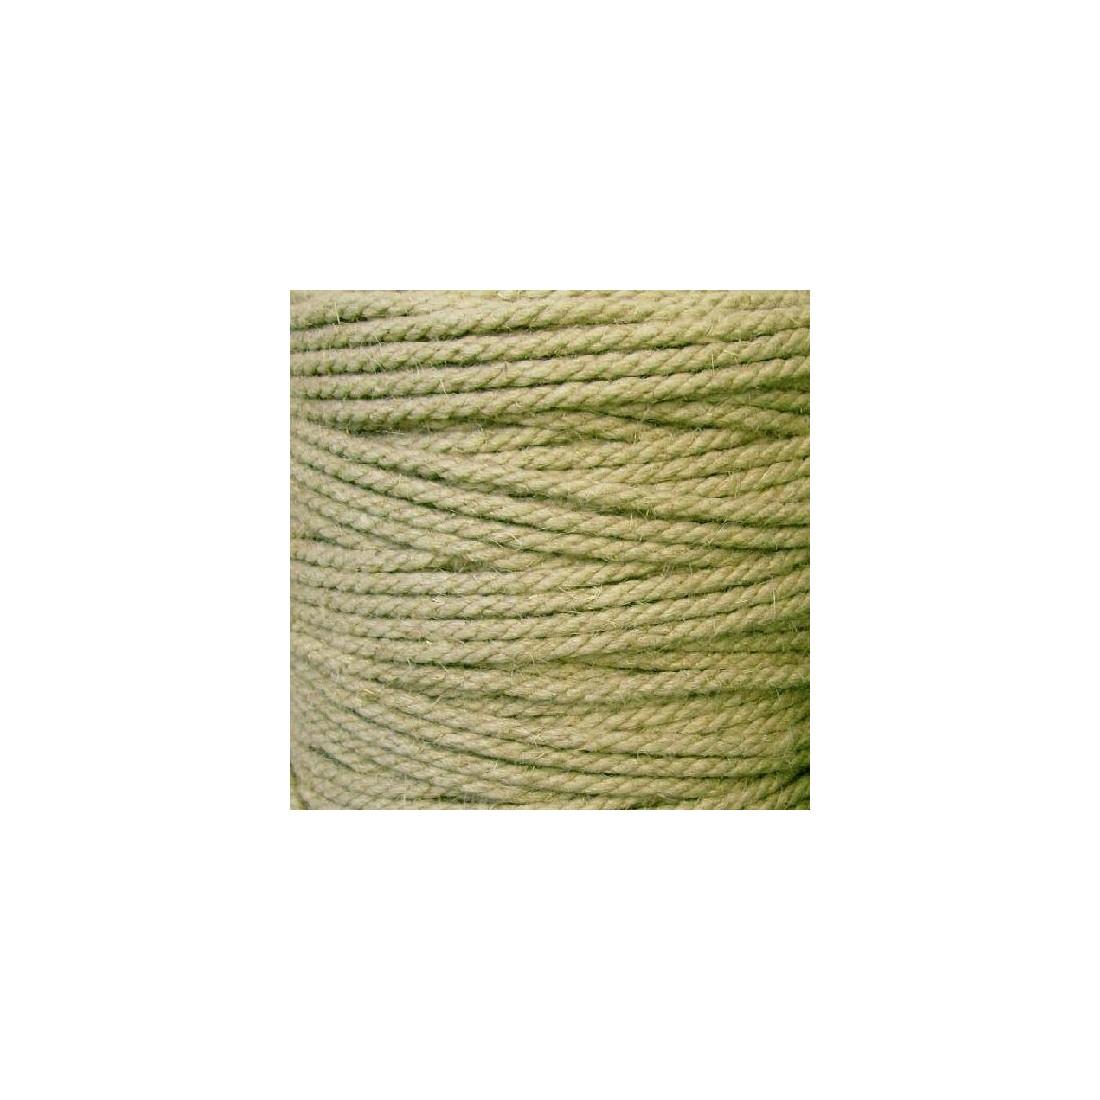 Cuerda de camo 6 mm fibras naturales